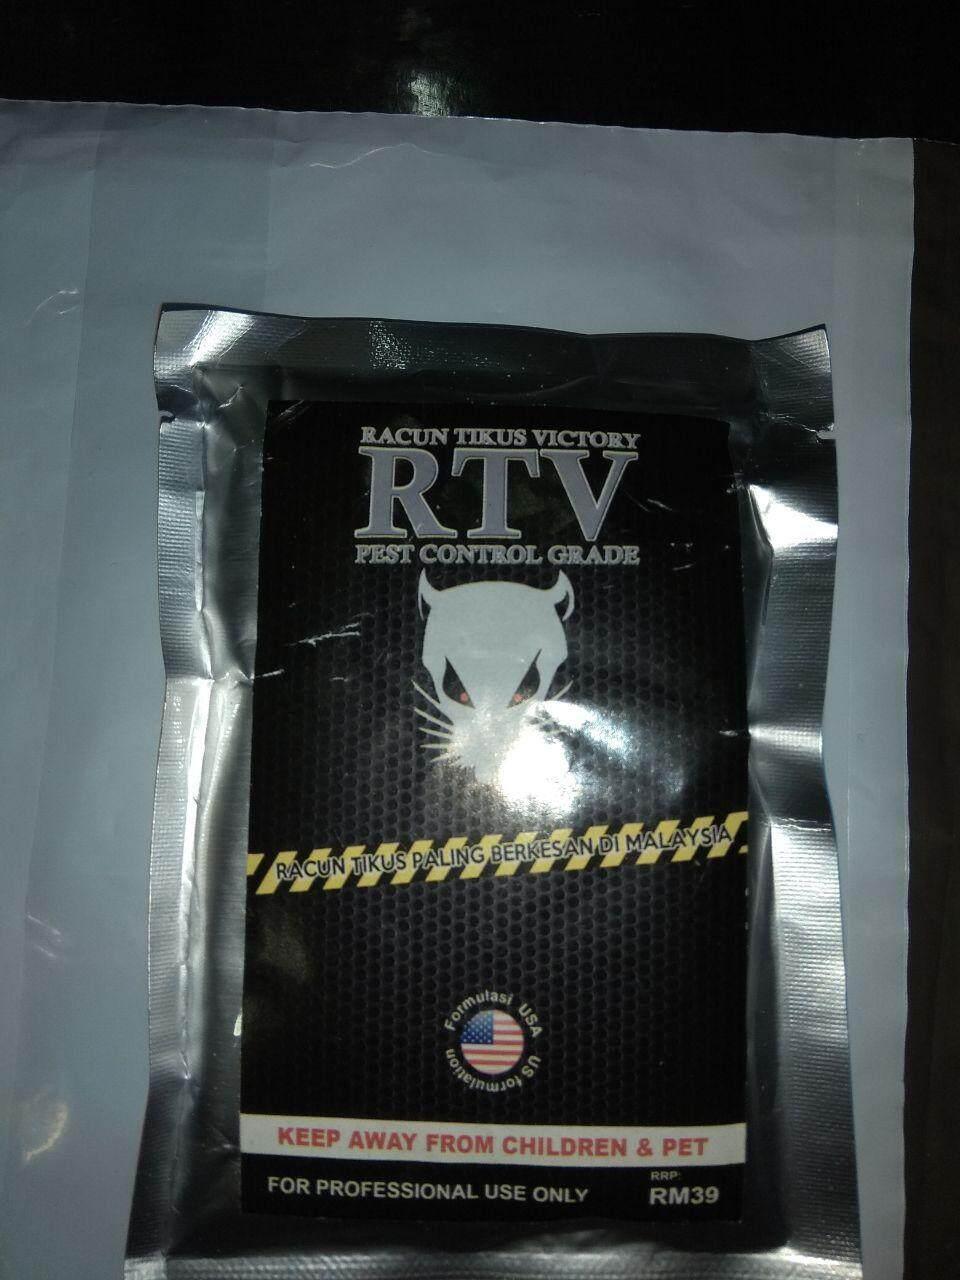 Racun Tikus RTV Sangat Berkesan Mudah Murah Dengan Kualiti Pest Control Rat Killer Strong Poison Mouse Killer